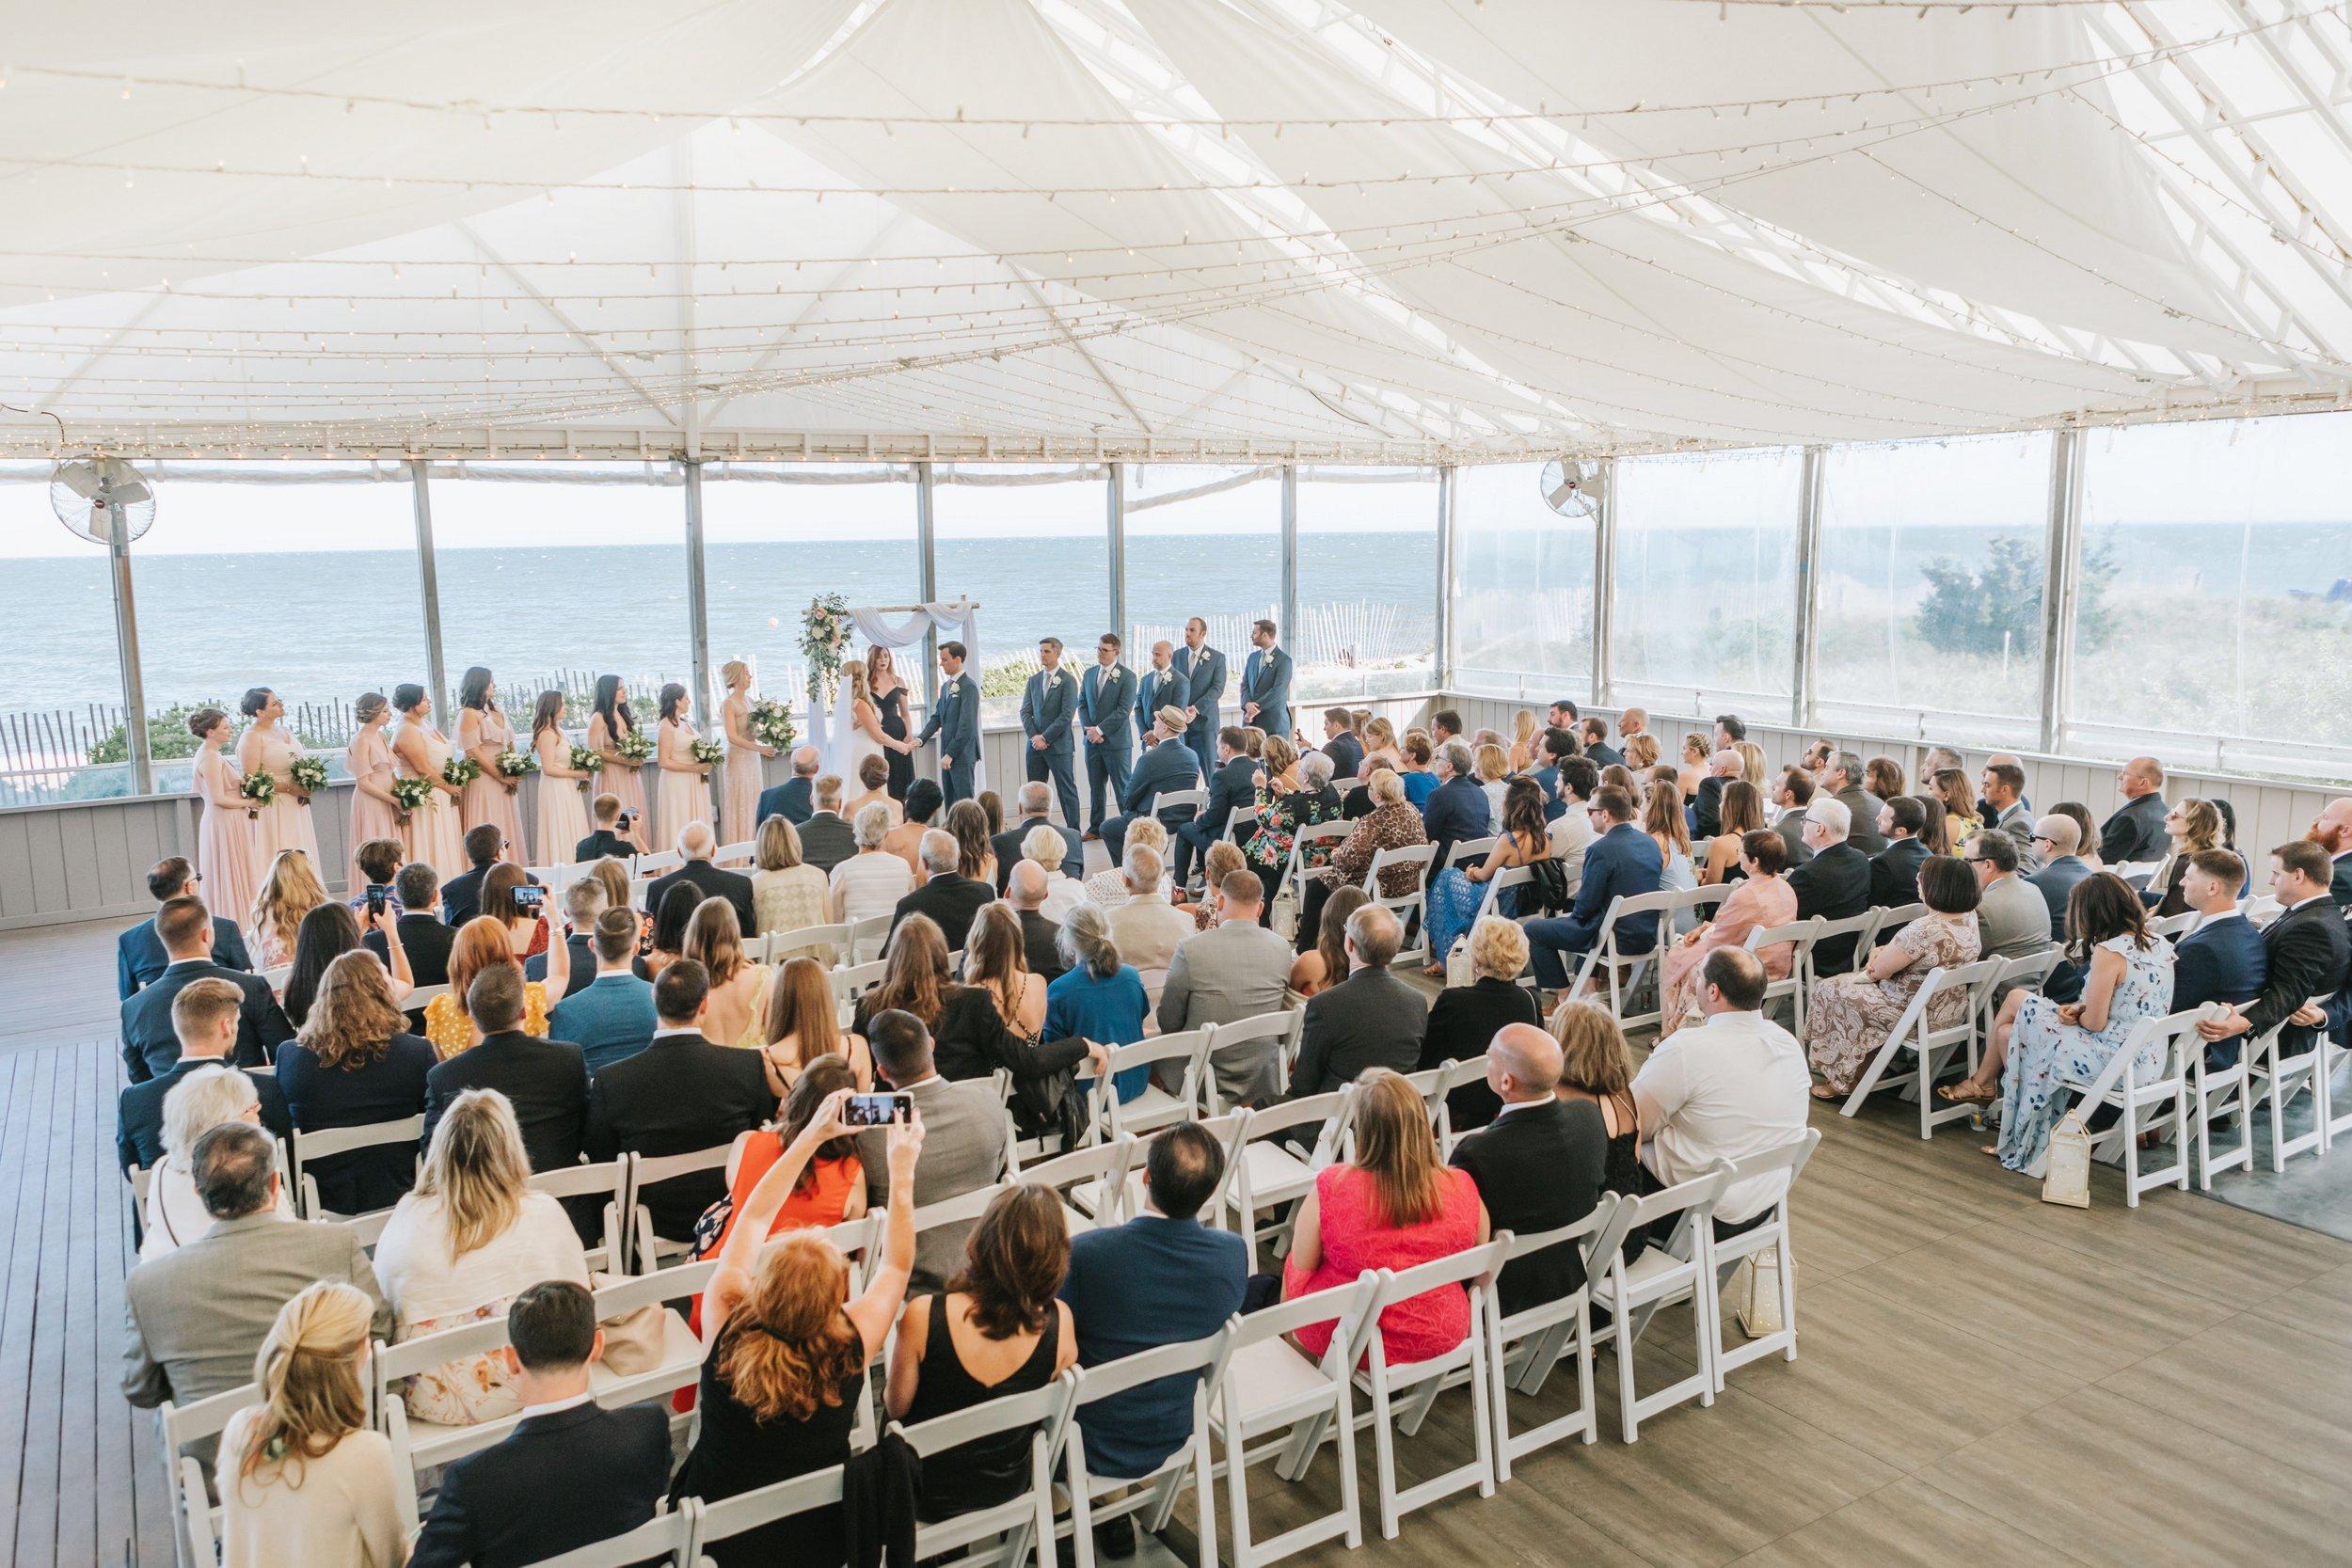 Popponesset-Inn-Wedding-Cape-Cod-Lena-Mirisola-Photography-33.jpg